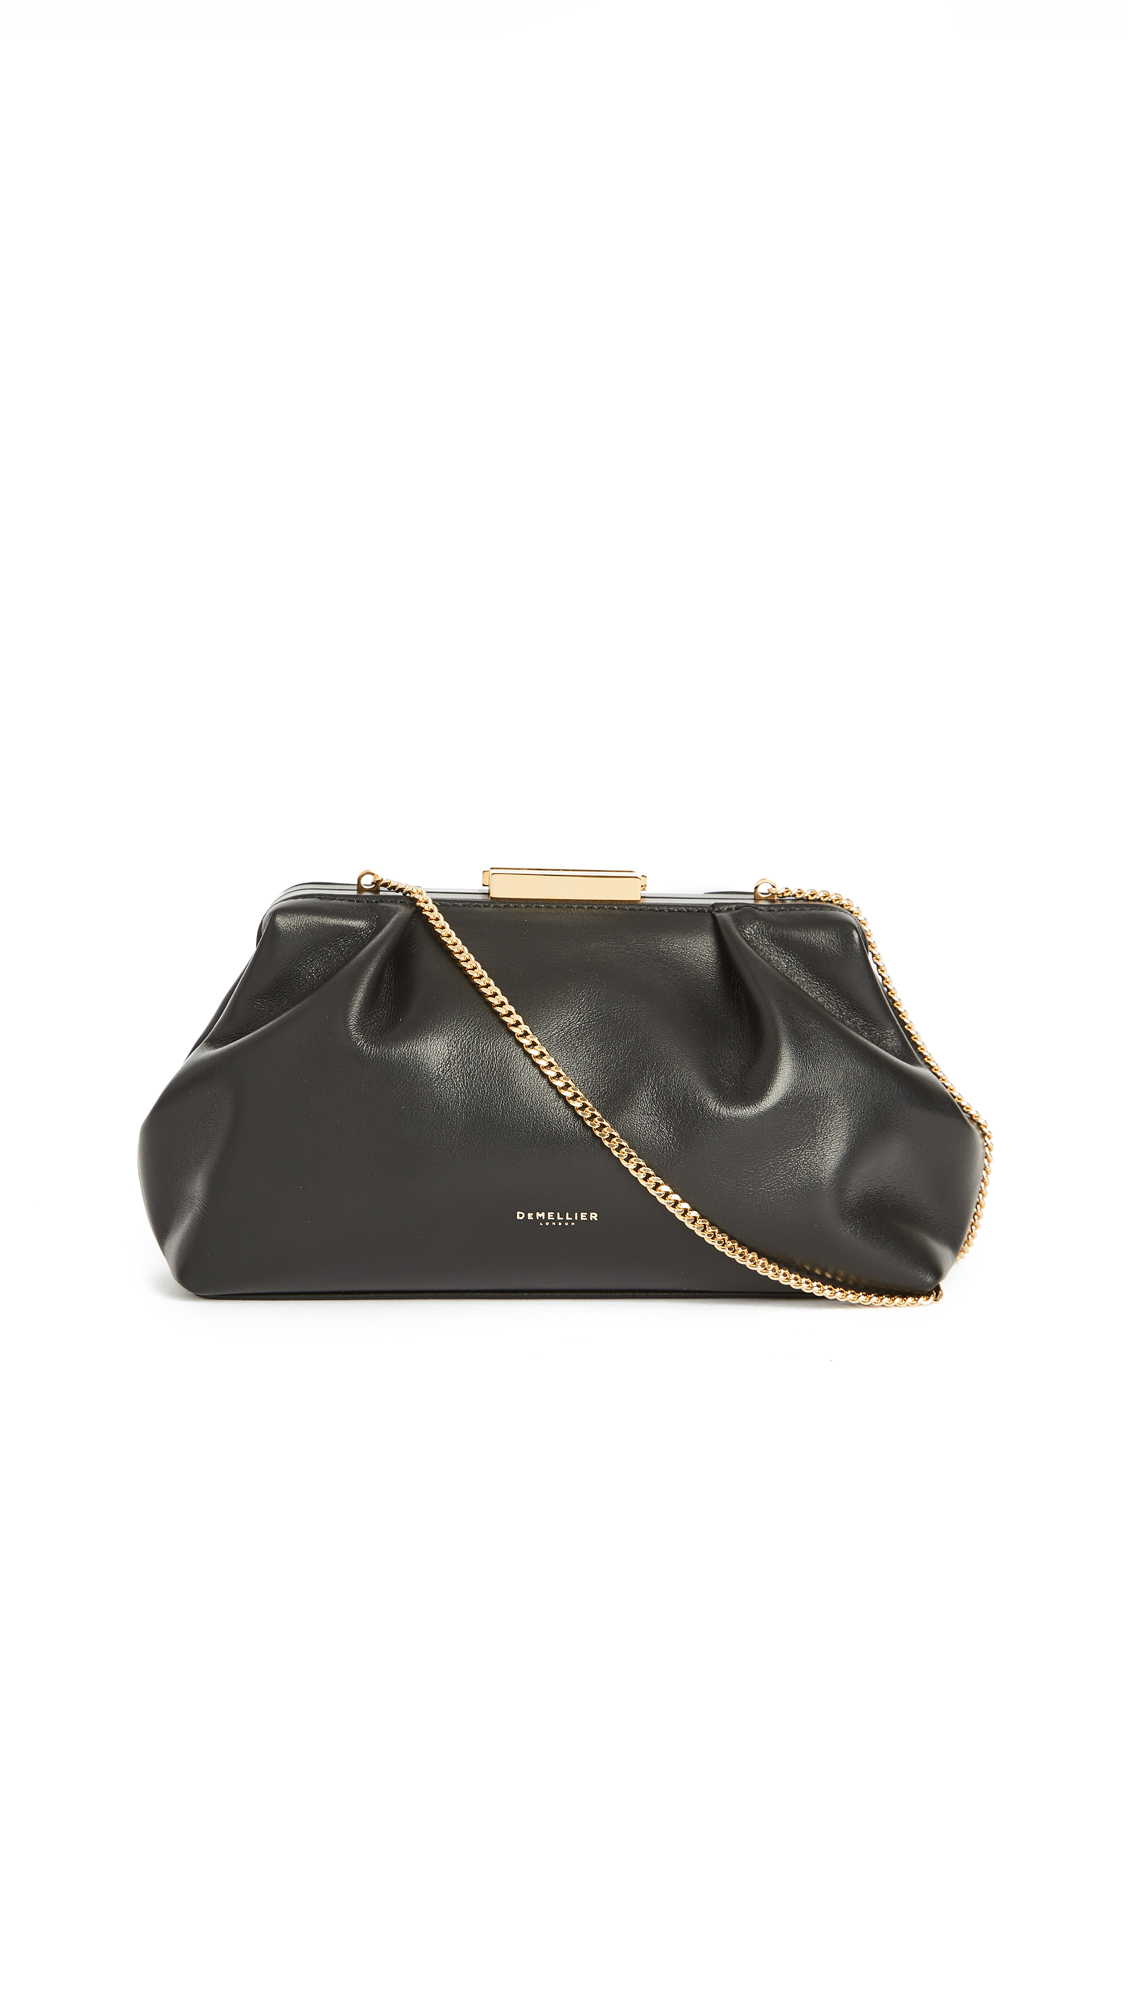 DeMellier Mini Florence Bag